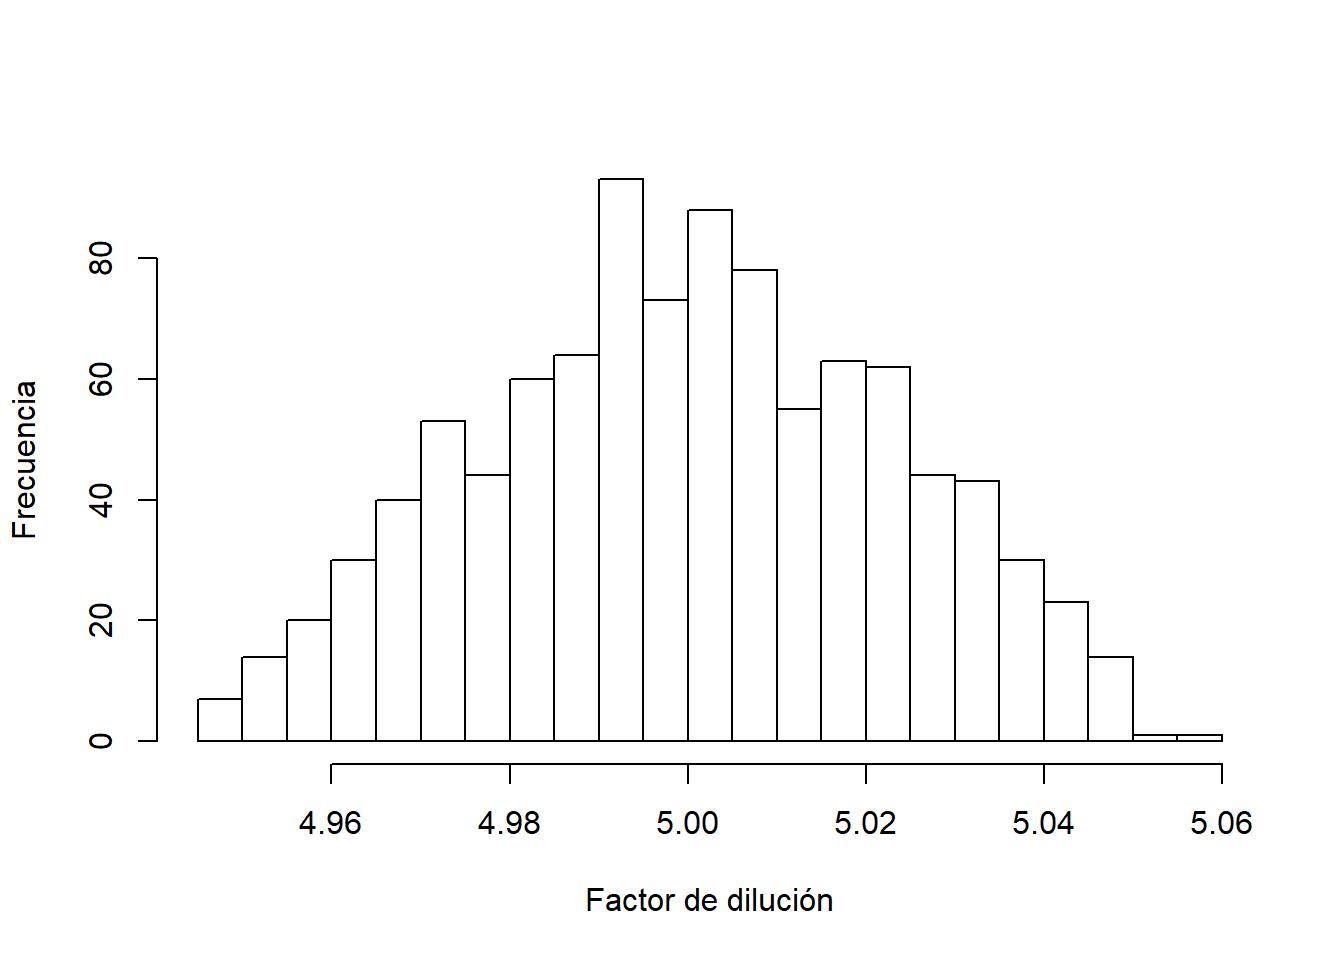 Histograma de factores de dilución simulados